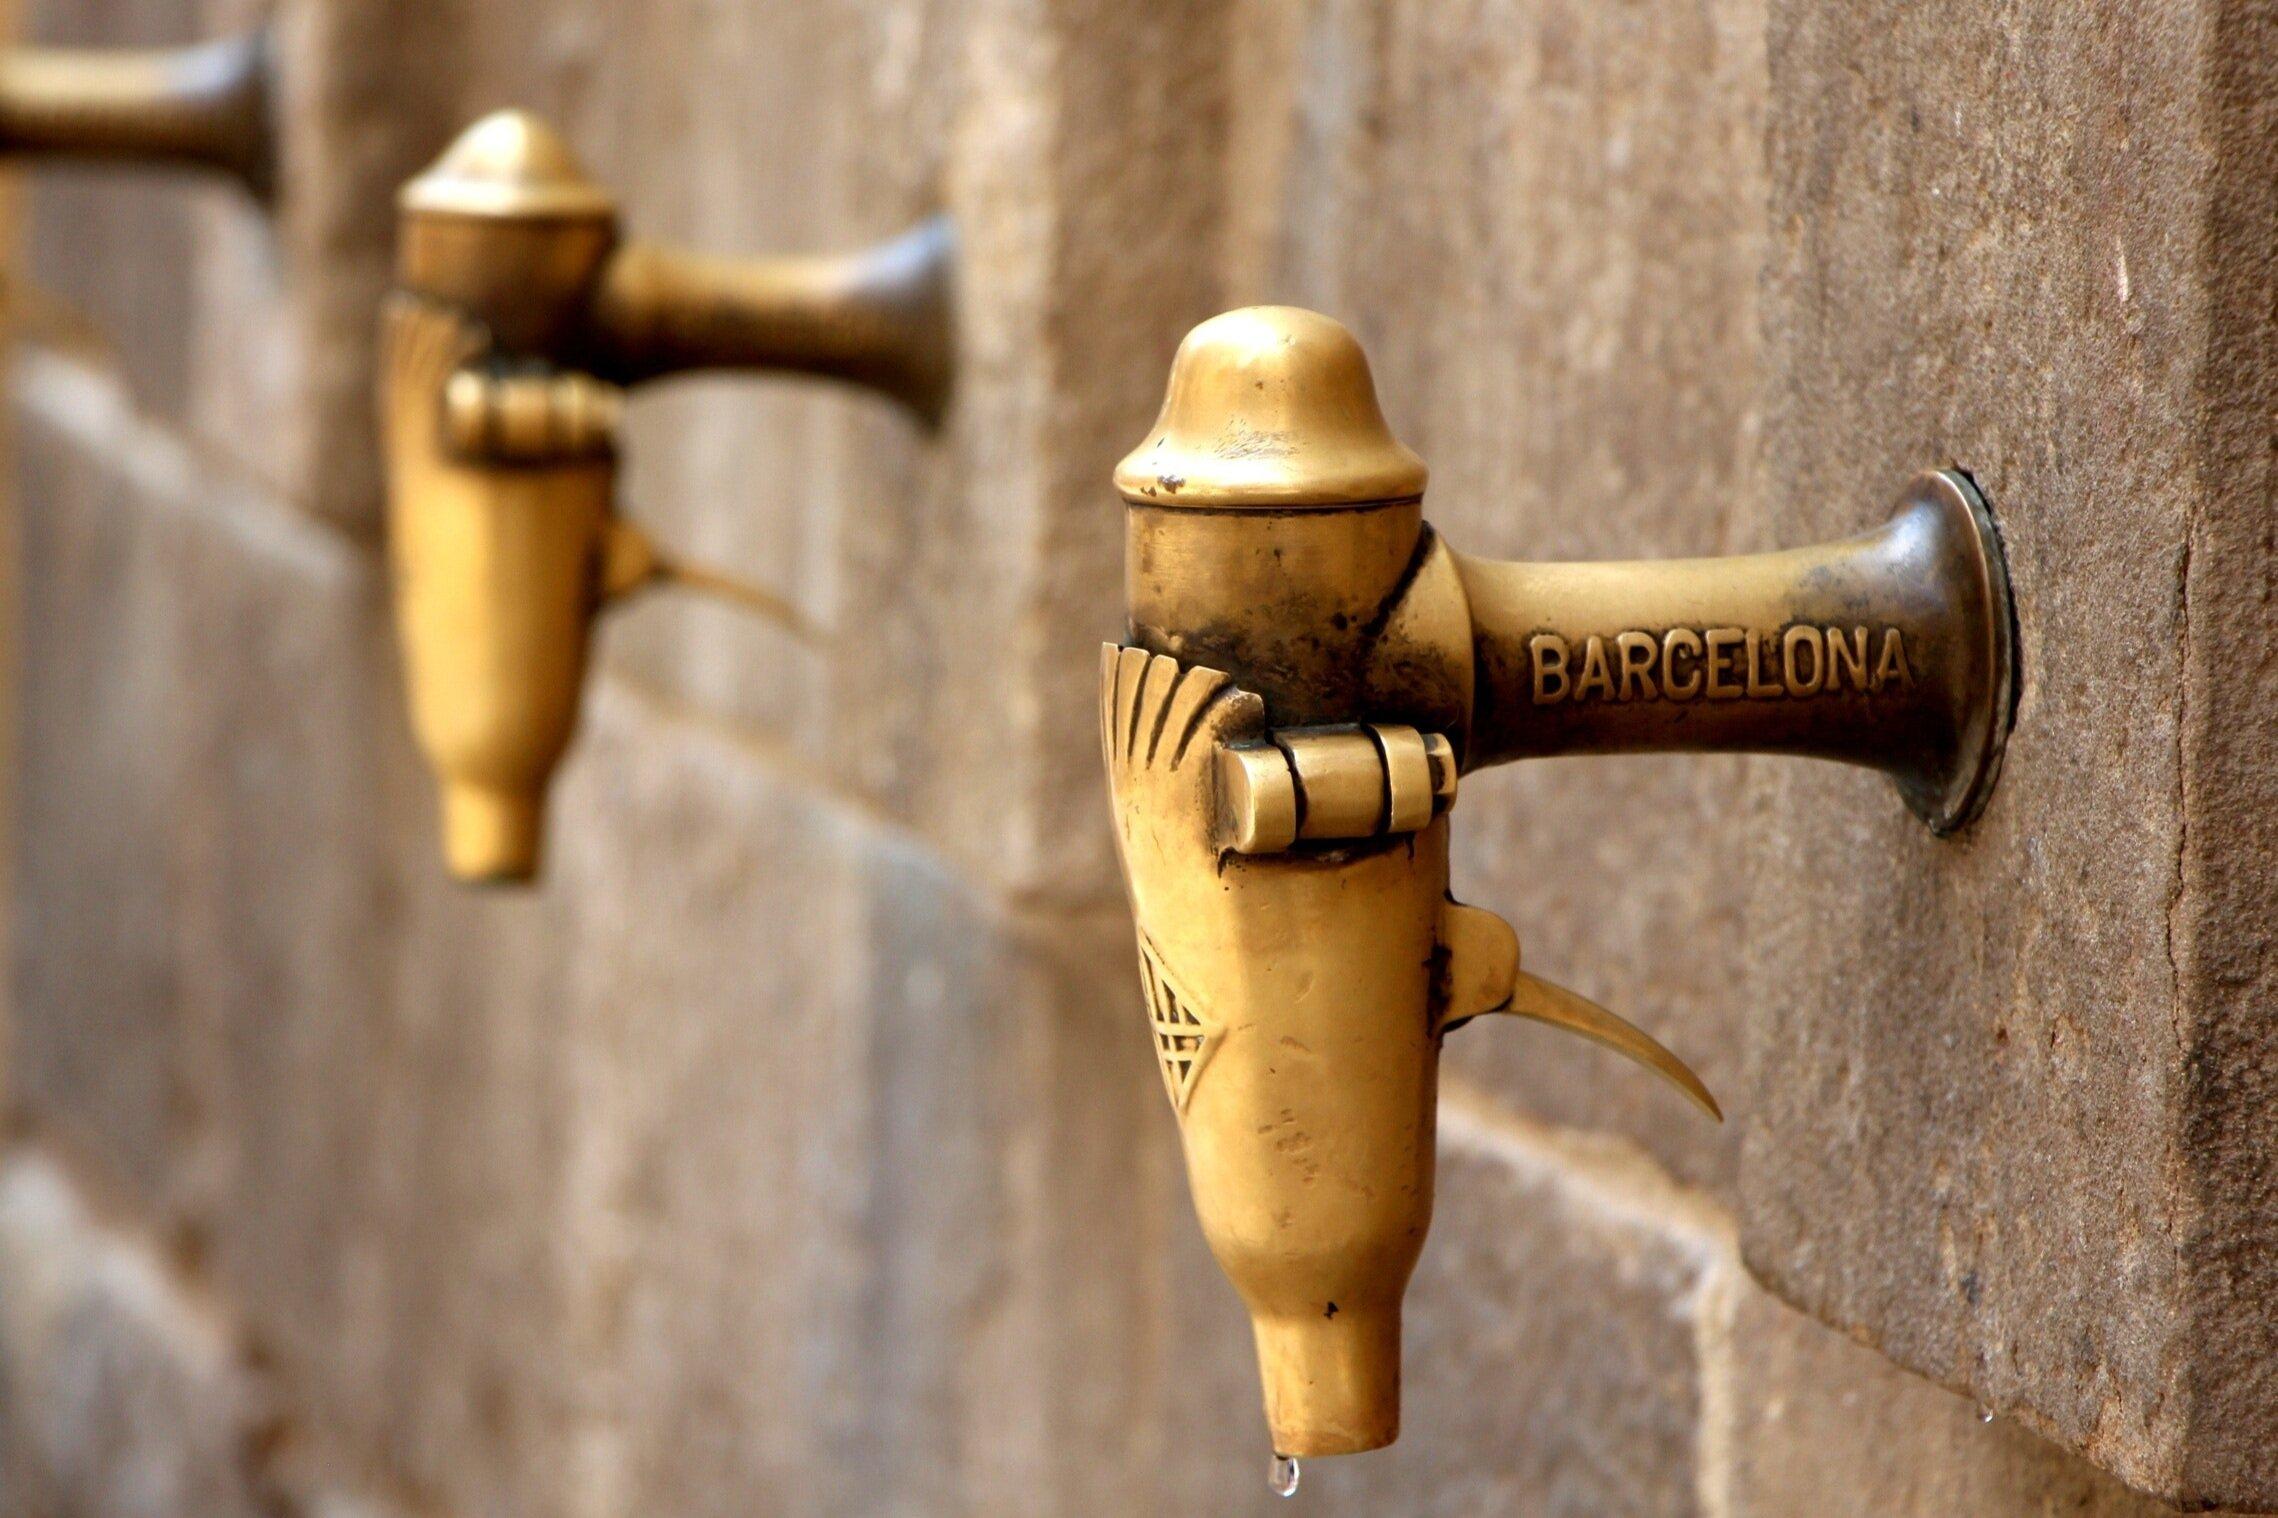 BARCELONA & SURROUNDINGS - Experiences selection in Barcelona